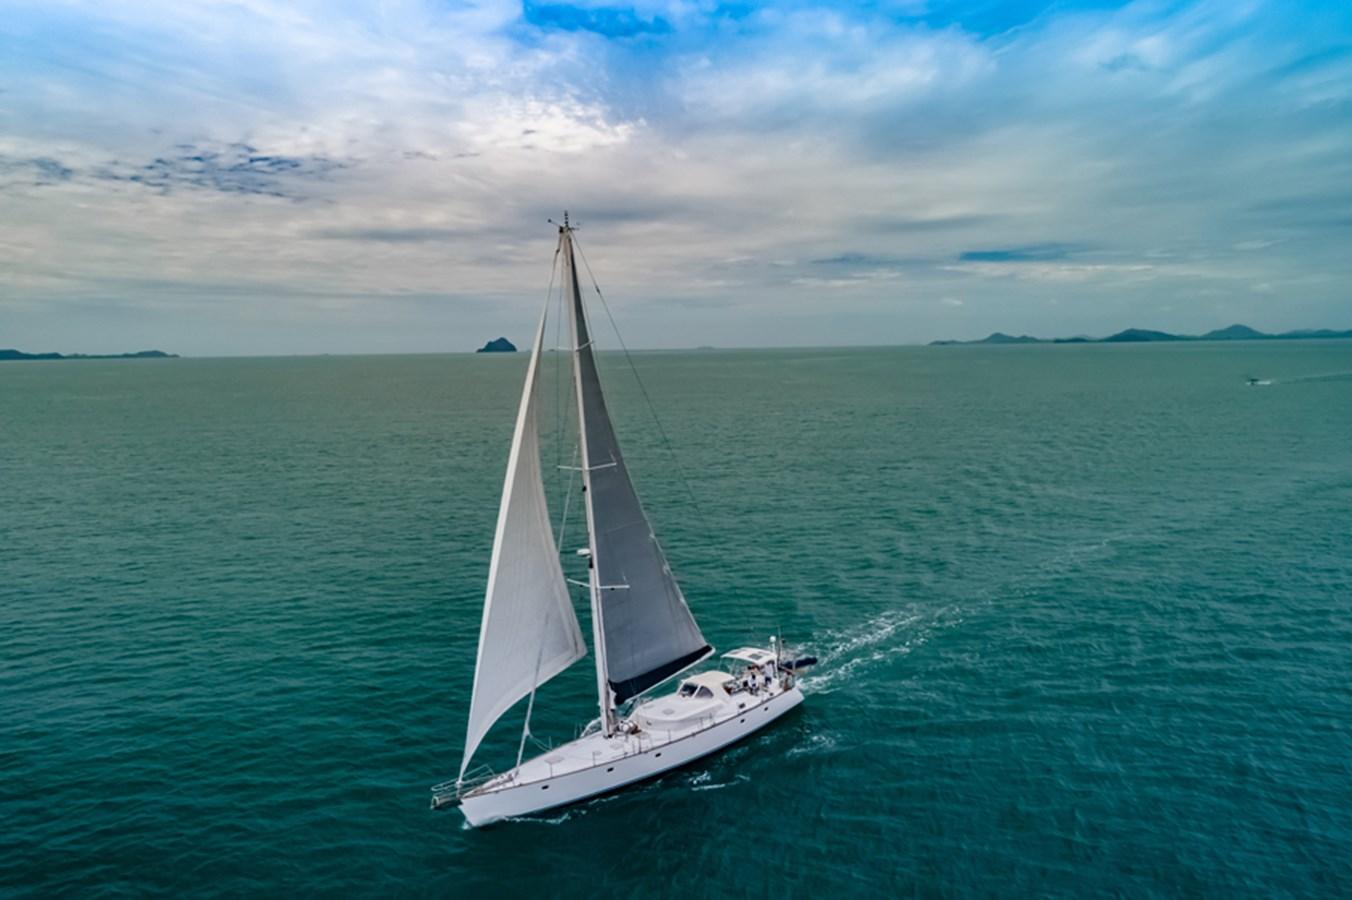 Yacht Marine 8 inch ABS Plastic Boat Deck Hatch For Boat Rib //Sailing Boat